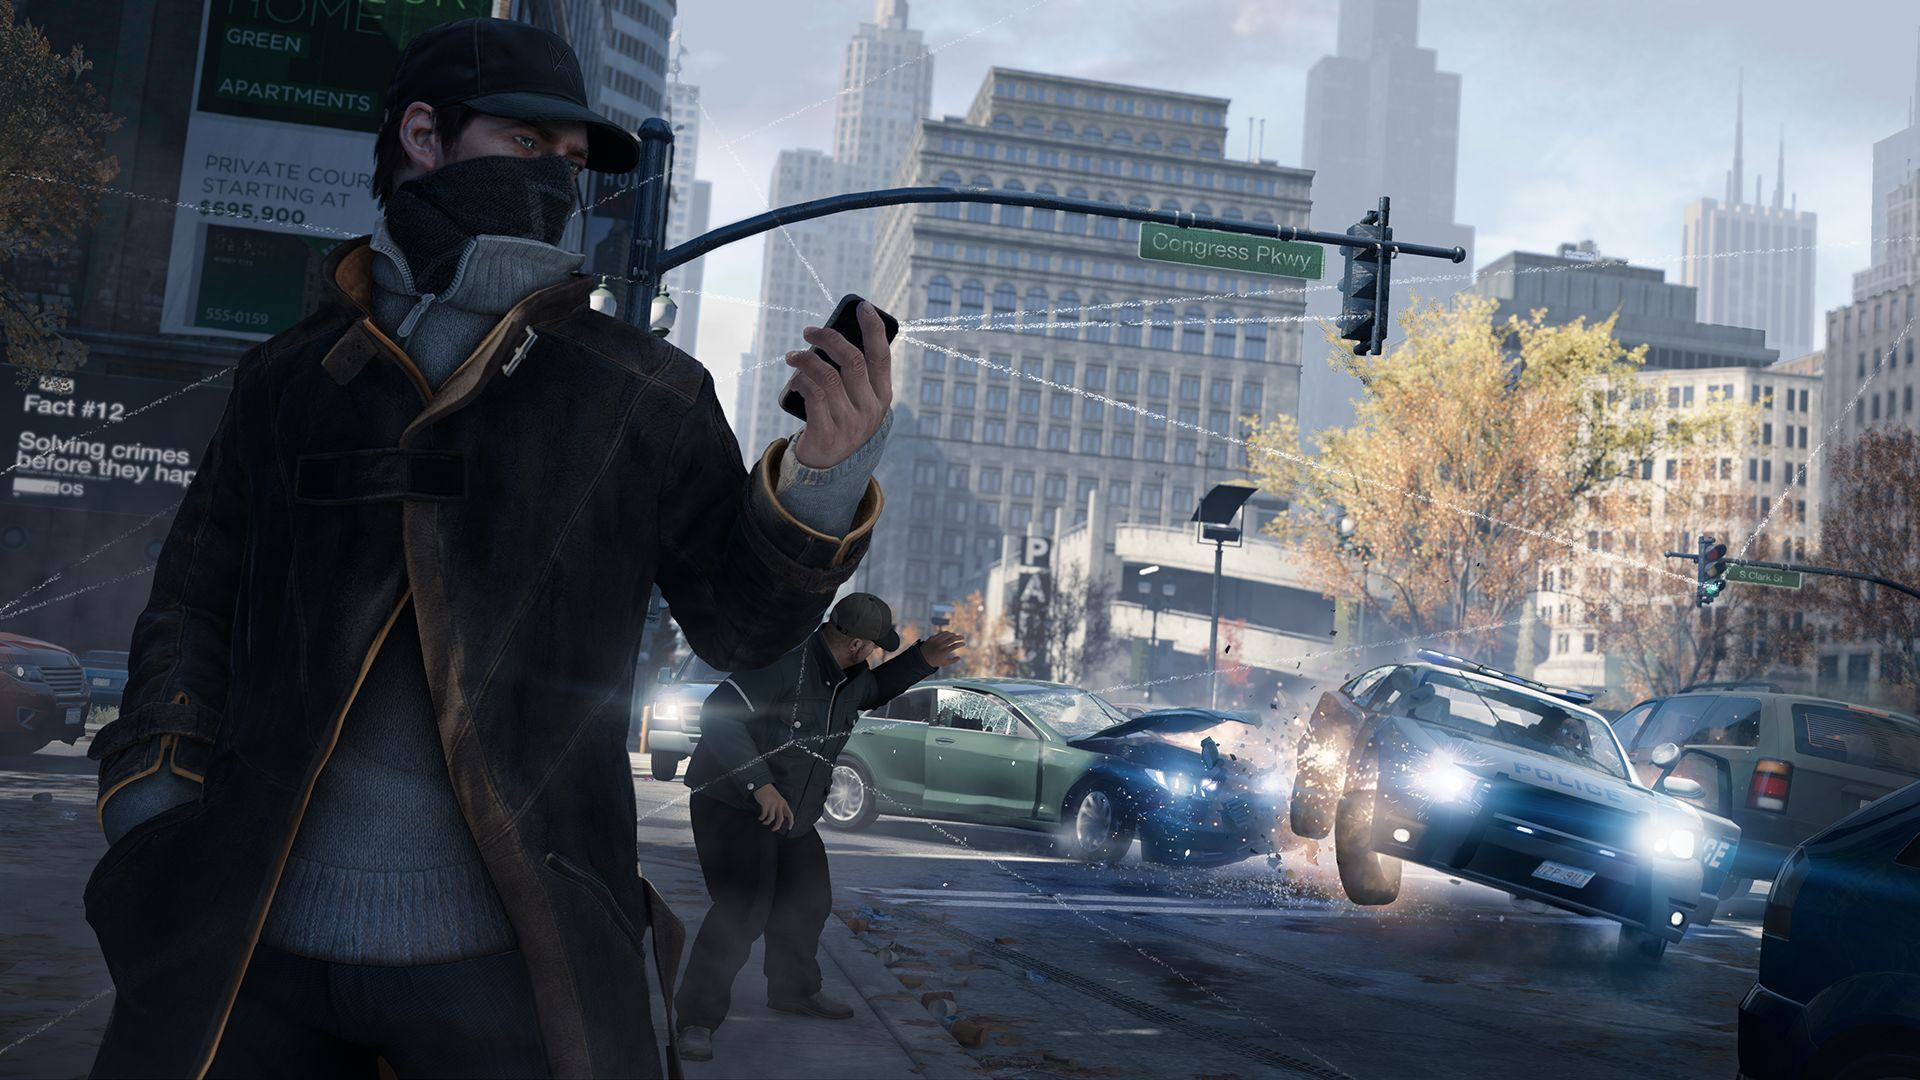 WATCH_DOGS (Xbox 360) - 11